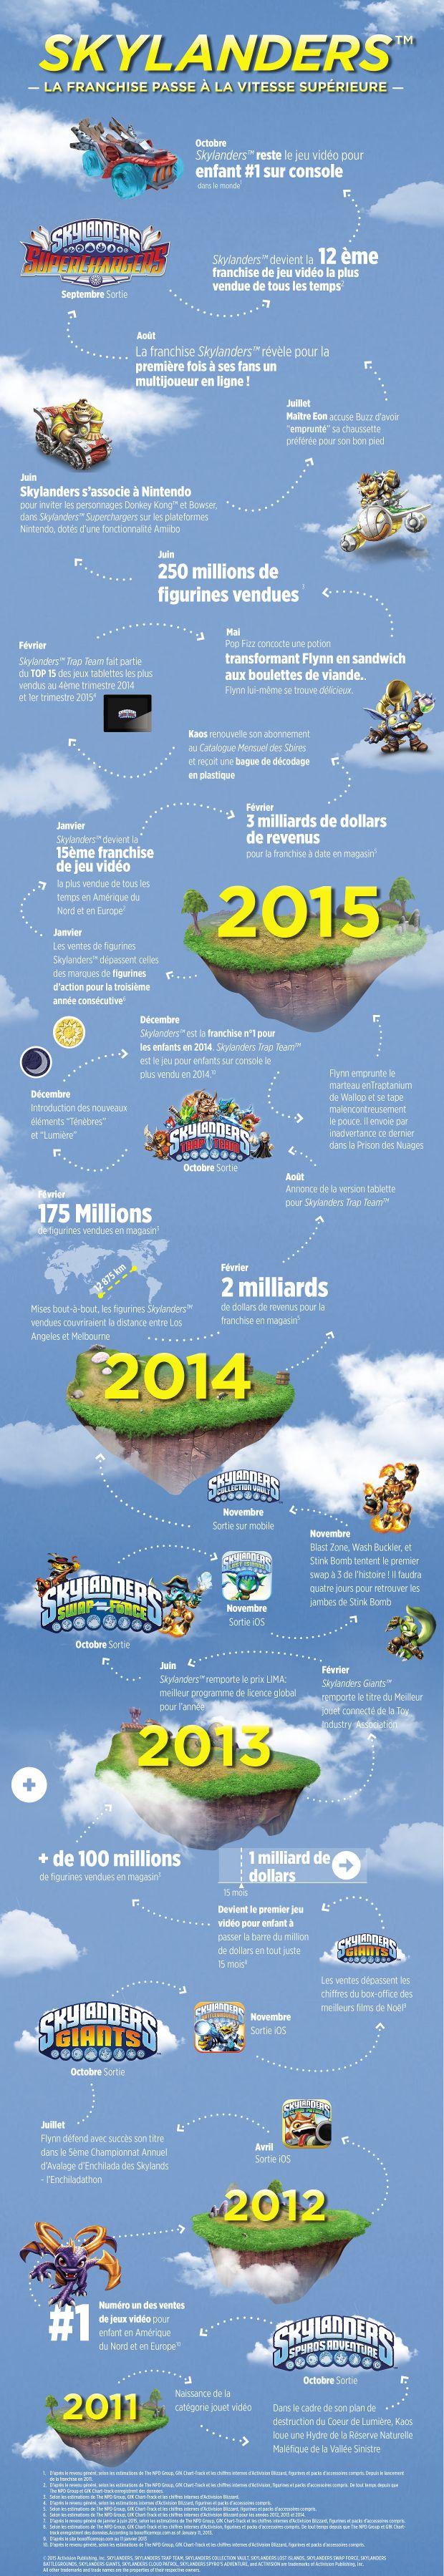 Skylanders infographie succès logo